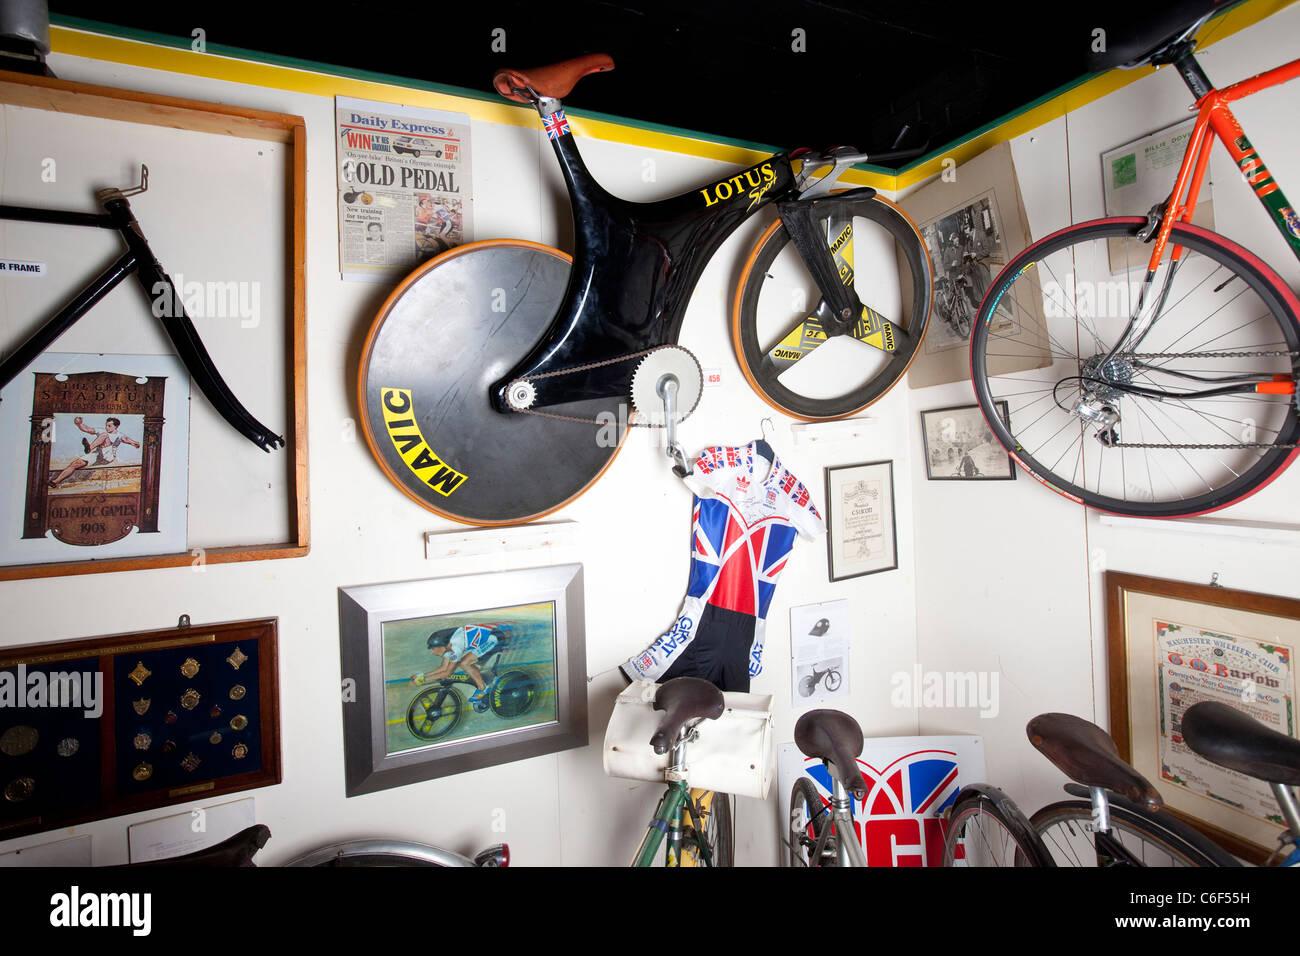 Boardman Bike Stock Photos & Boardman Bike Stock Images - Alamy